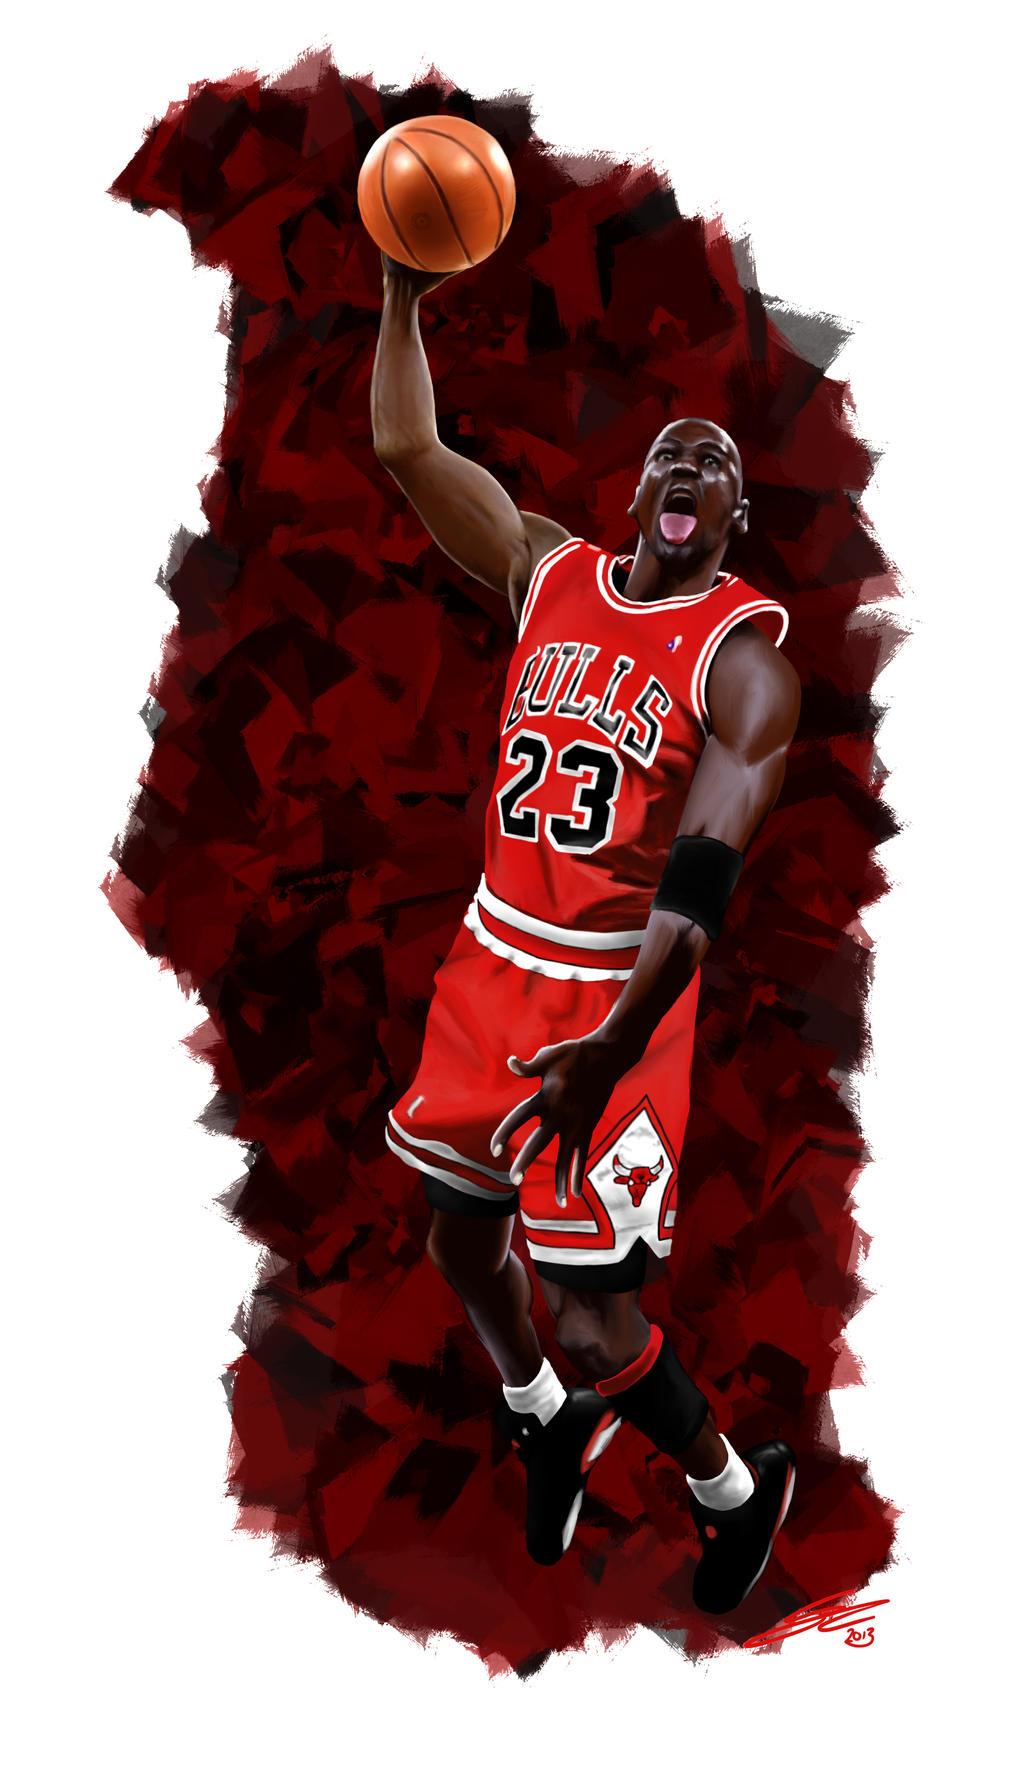 Michael Jordan - Digital Painting